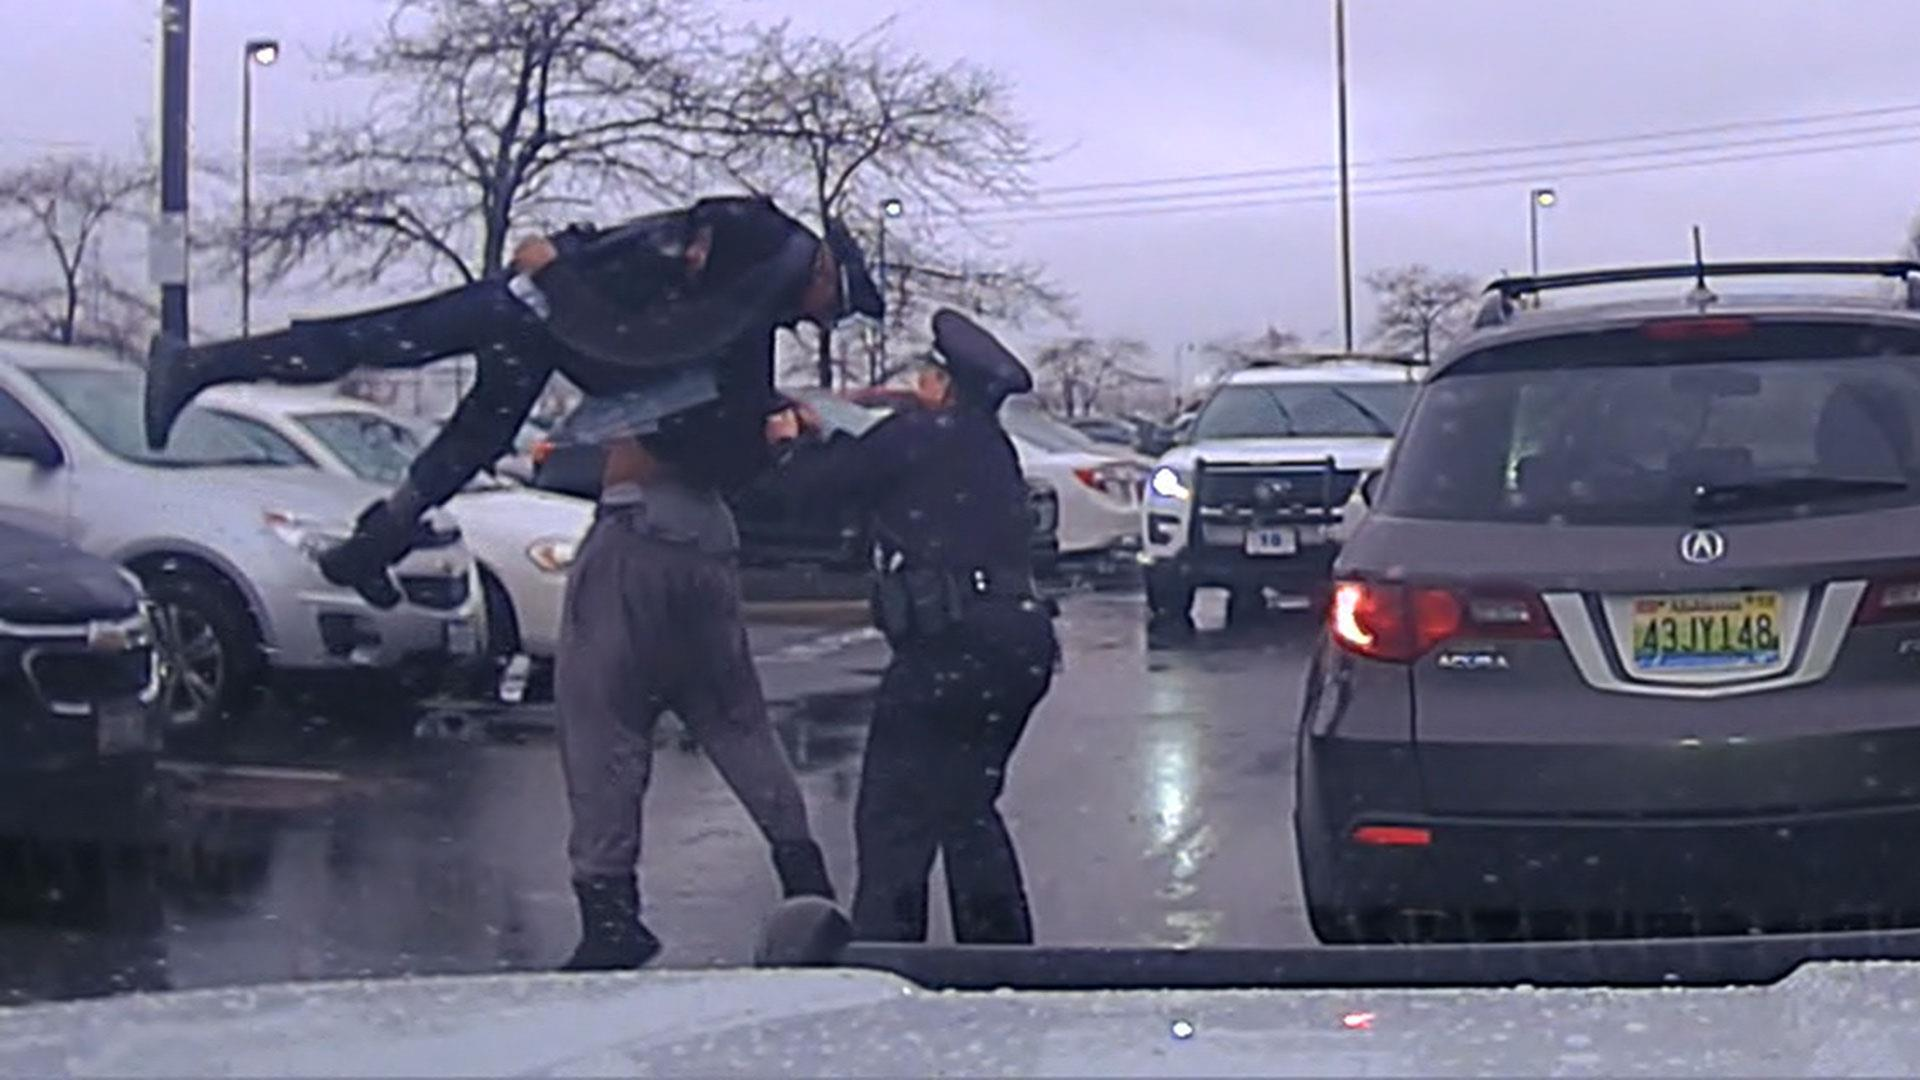 College football player seen body-slamming Ohio officer in dashcam video